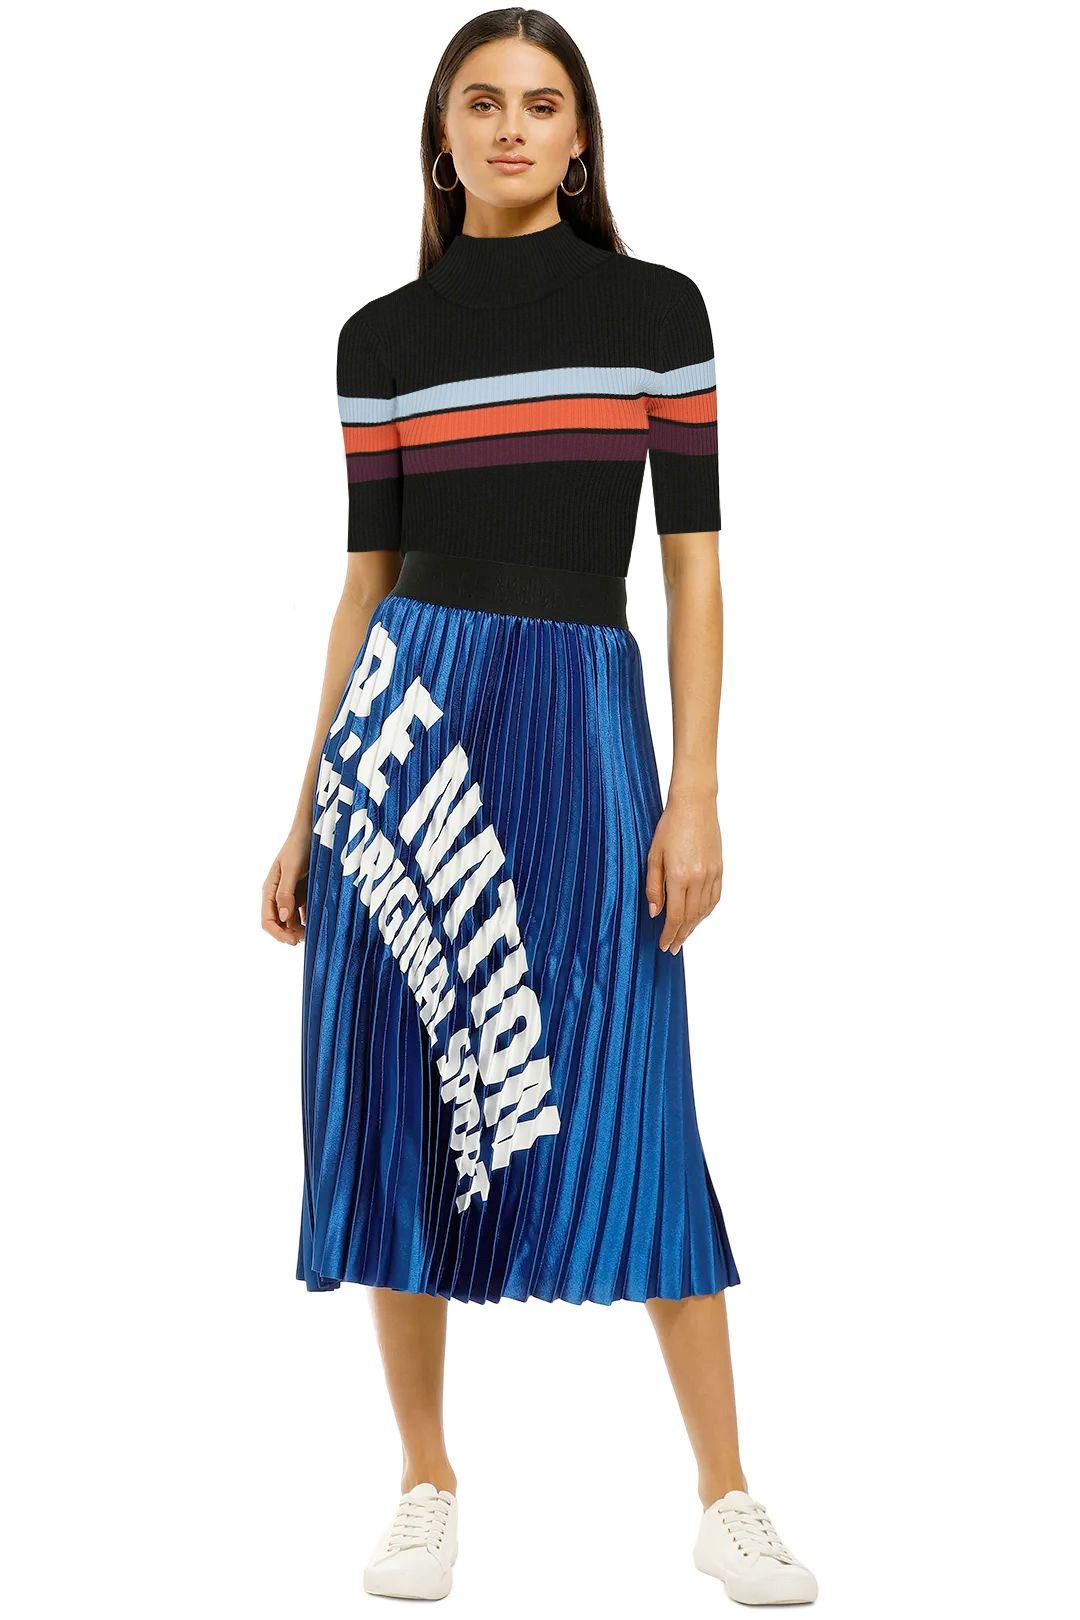 Bande-Studio-Keystone-Rib-Knit-Tee-Black-Stripe-Front